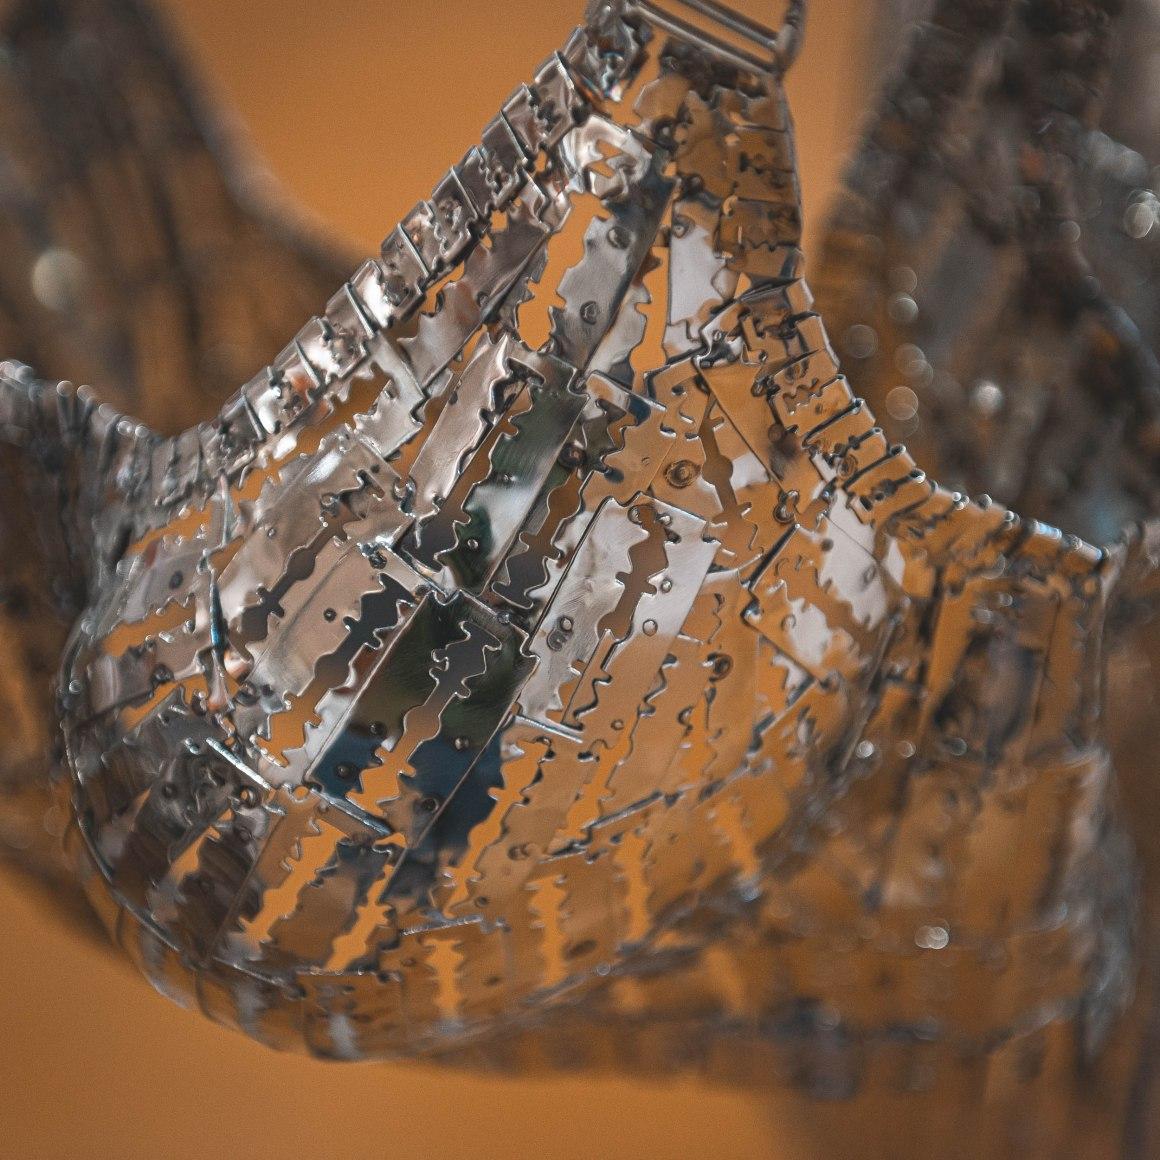 delhi contemporary art week, art gallery, vadehra art gallery, blueprint12, blueprint 12, exhibit 320, laittude 28, exhibit320, latitude28, nature morte, shrine empire, DCAW2019, DCAW, Art week, India art week, art week in New Delhi, new delhi art galleries, india art galleries, contemporary art, indian contemporary art, naina redhu, naina.co, khaosphilos, indian artist, indian contemporary artist